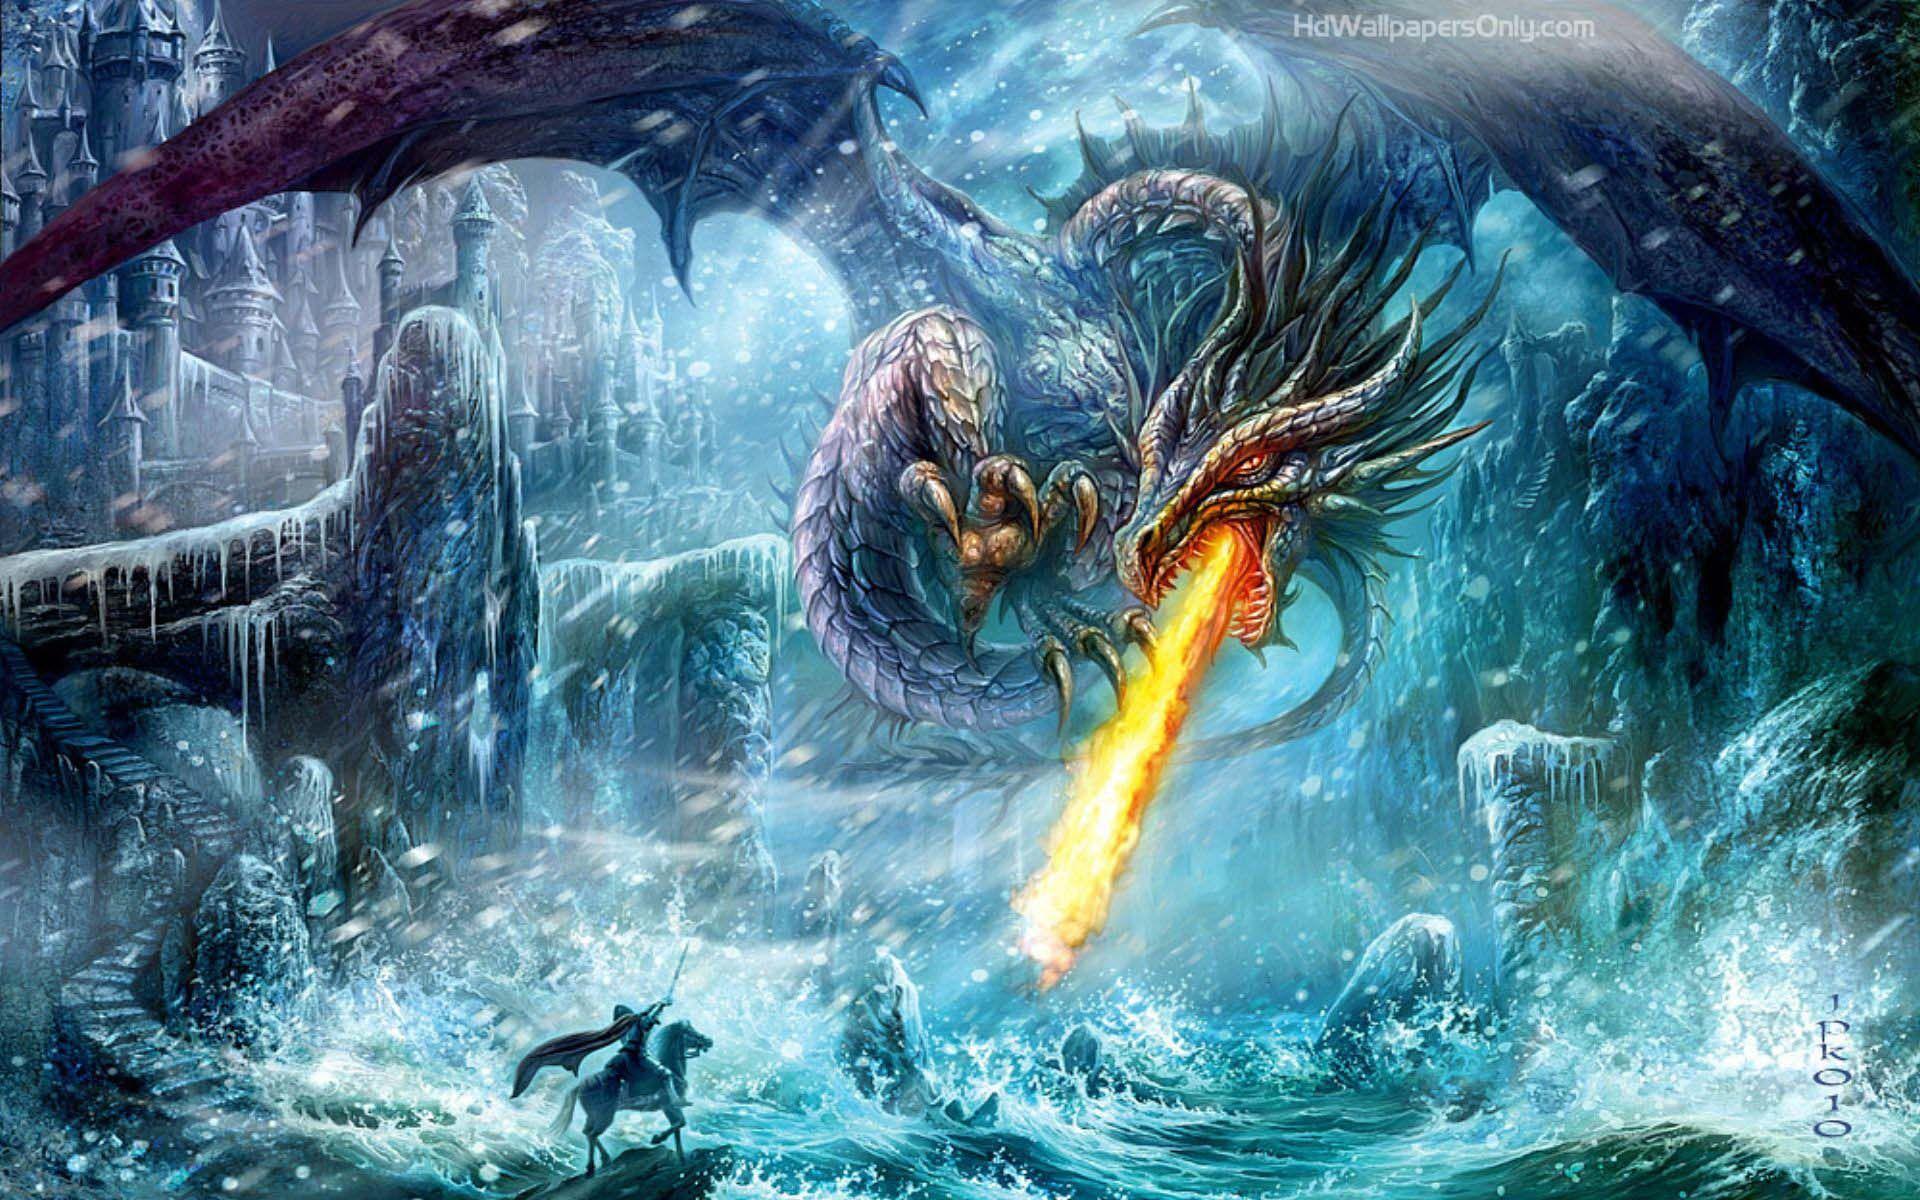 Dragon Battle In Snow Creature Artwork Fantasy Dragon Art Club Desktop dragon nest sea wallpaper hd